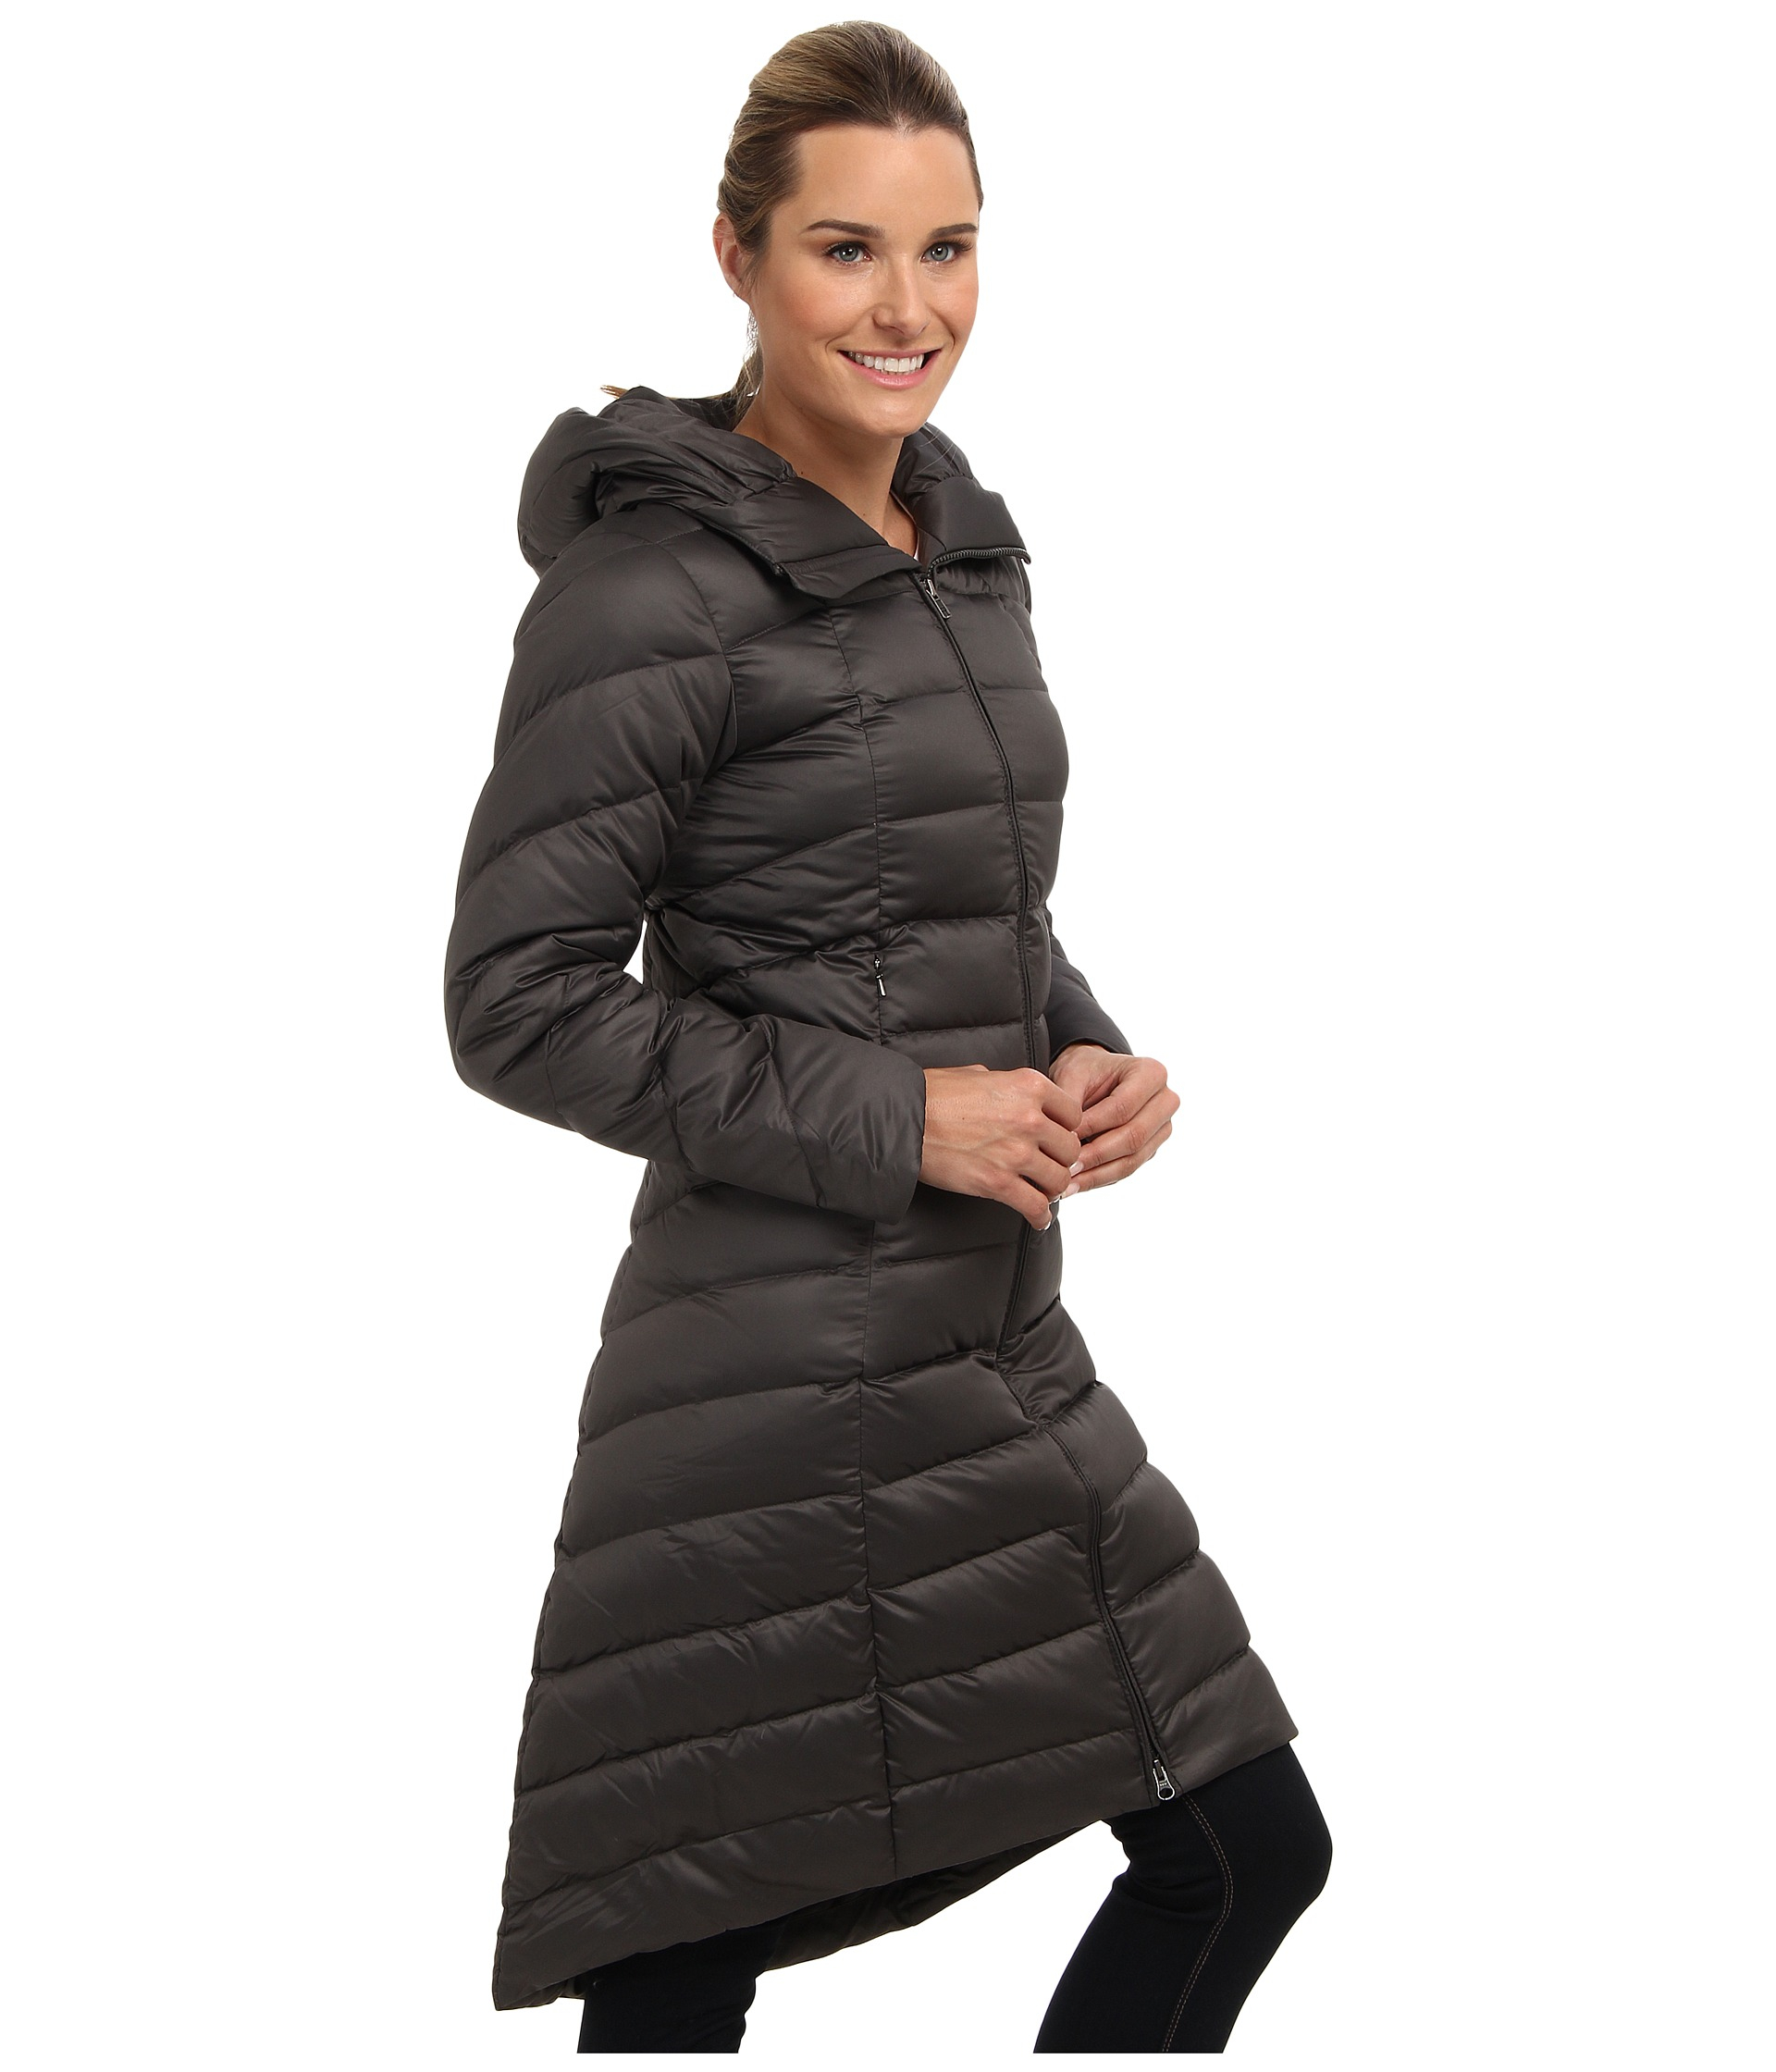 Patagonia downtown loft jacket hood